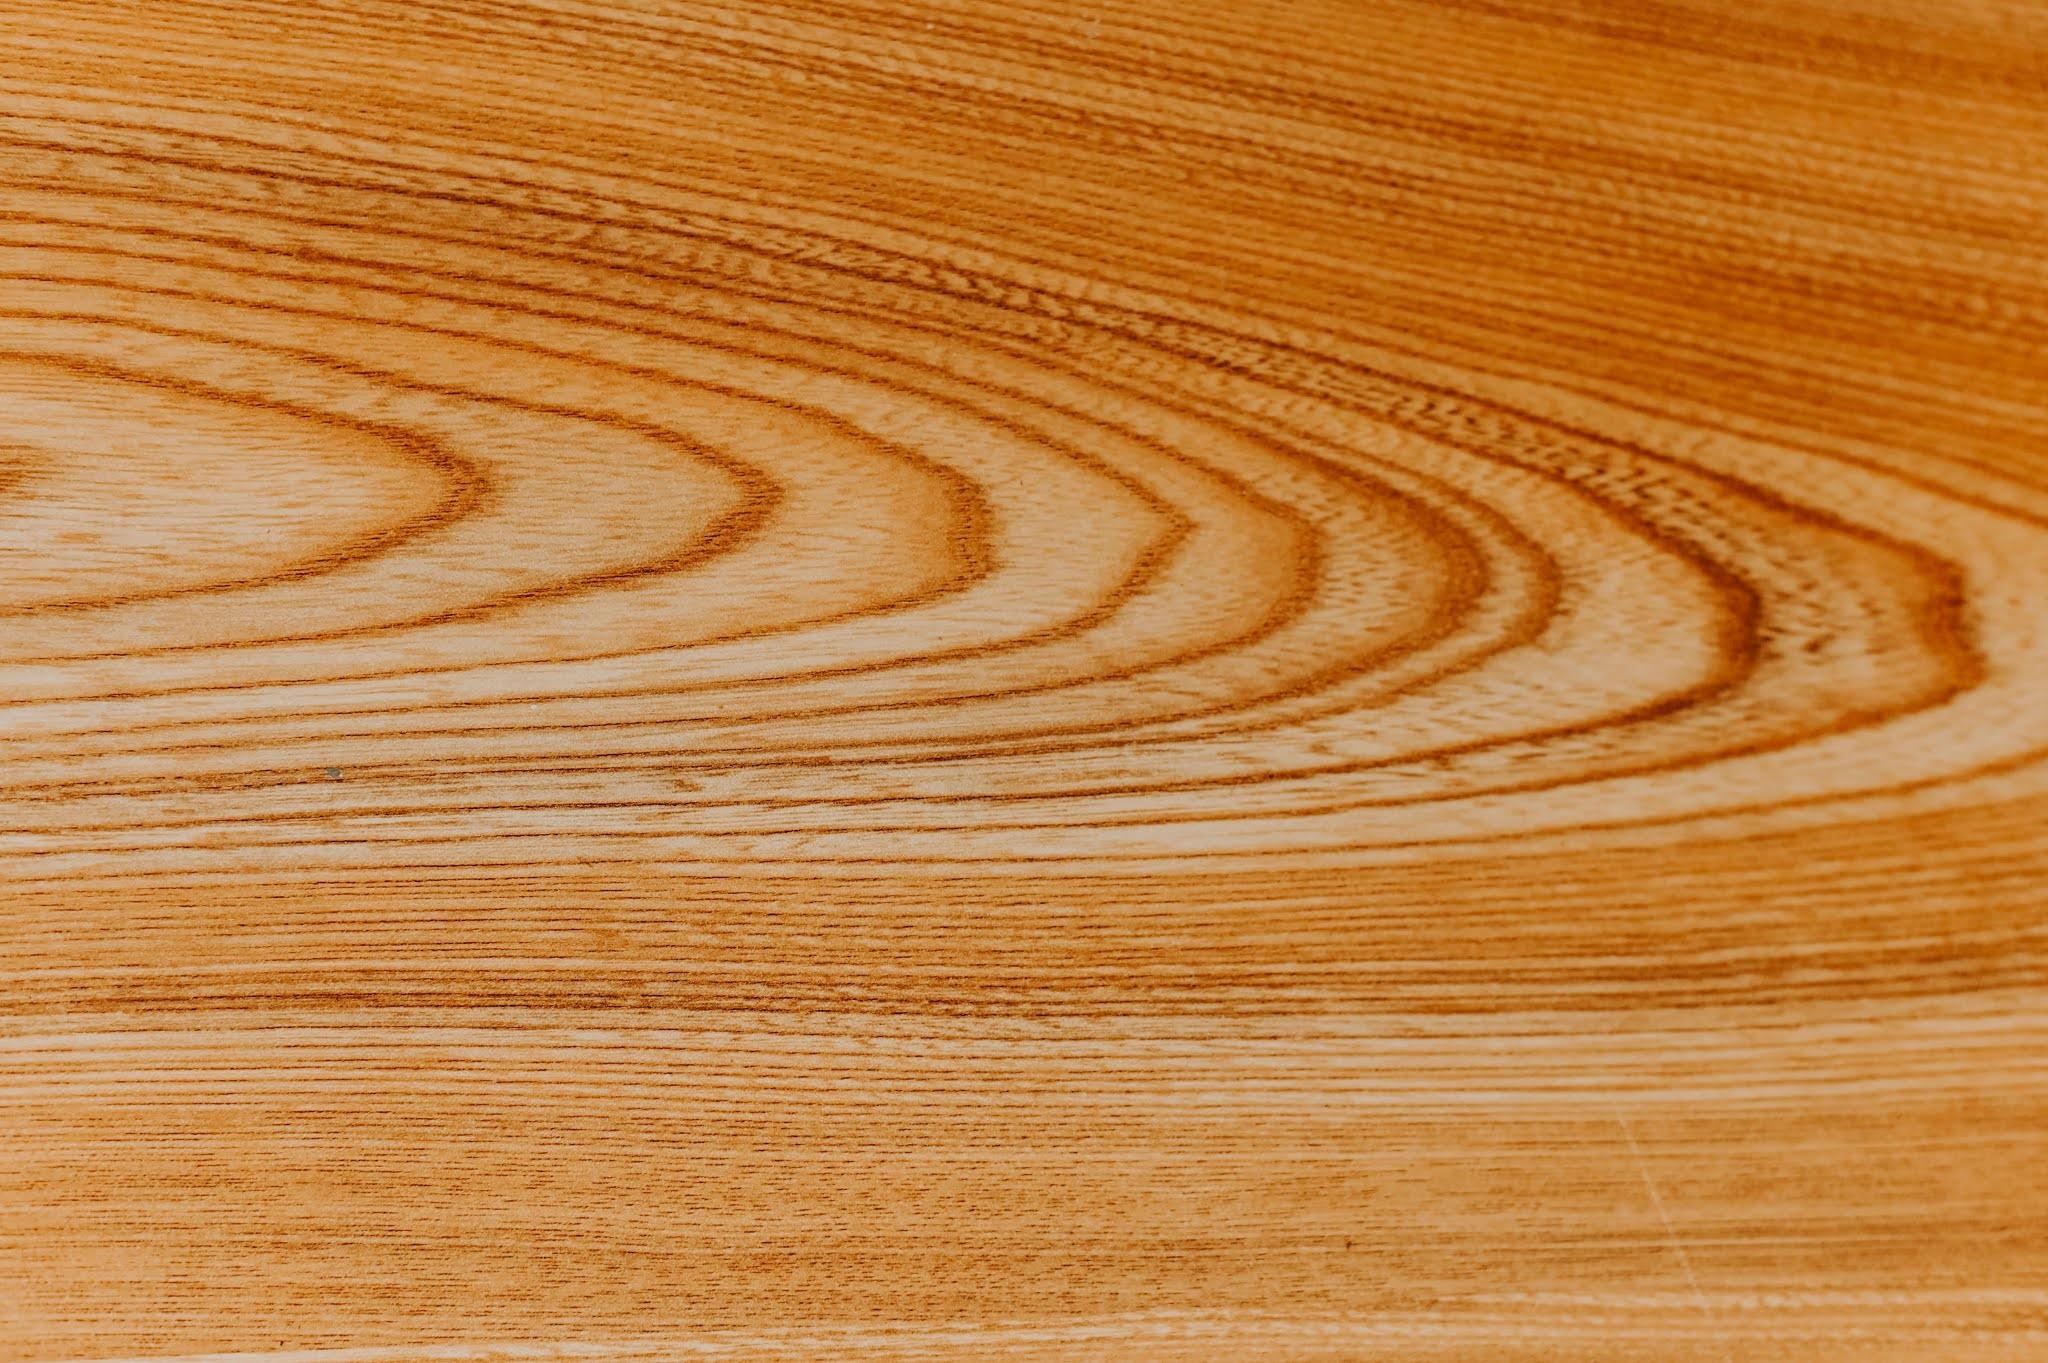 انواع الاخشاب بالصور from 1.bp.blogspot.com